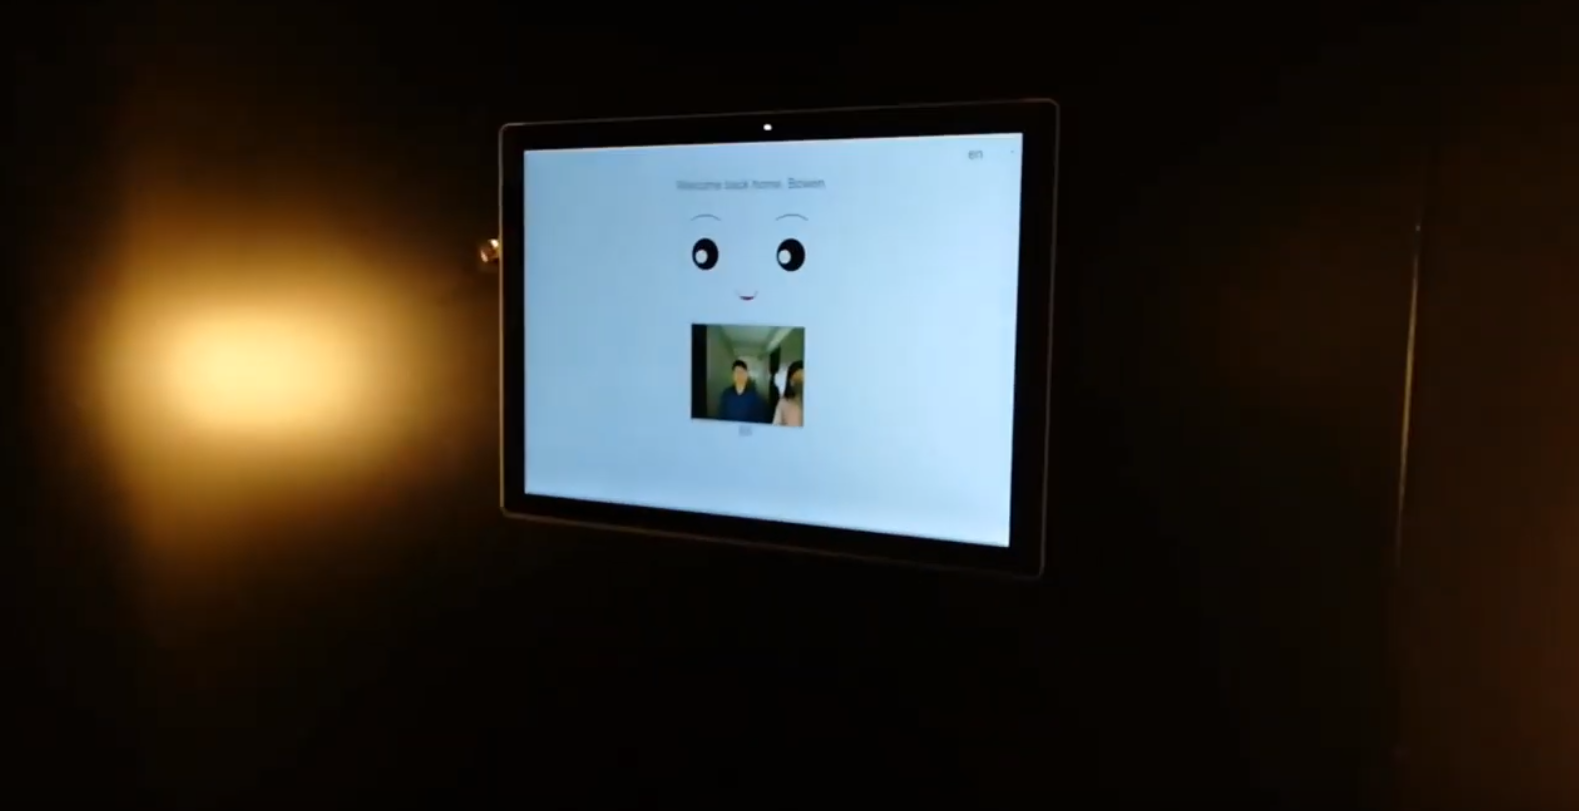 face-recognition · GitHub Topics · GitHub